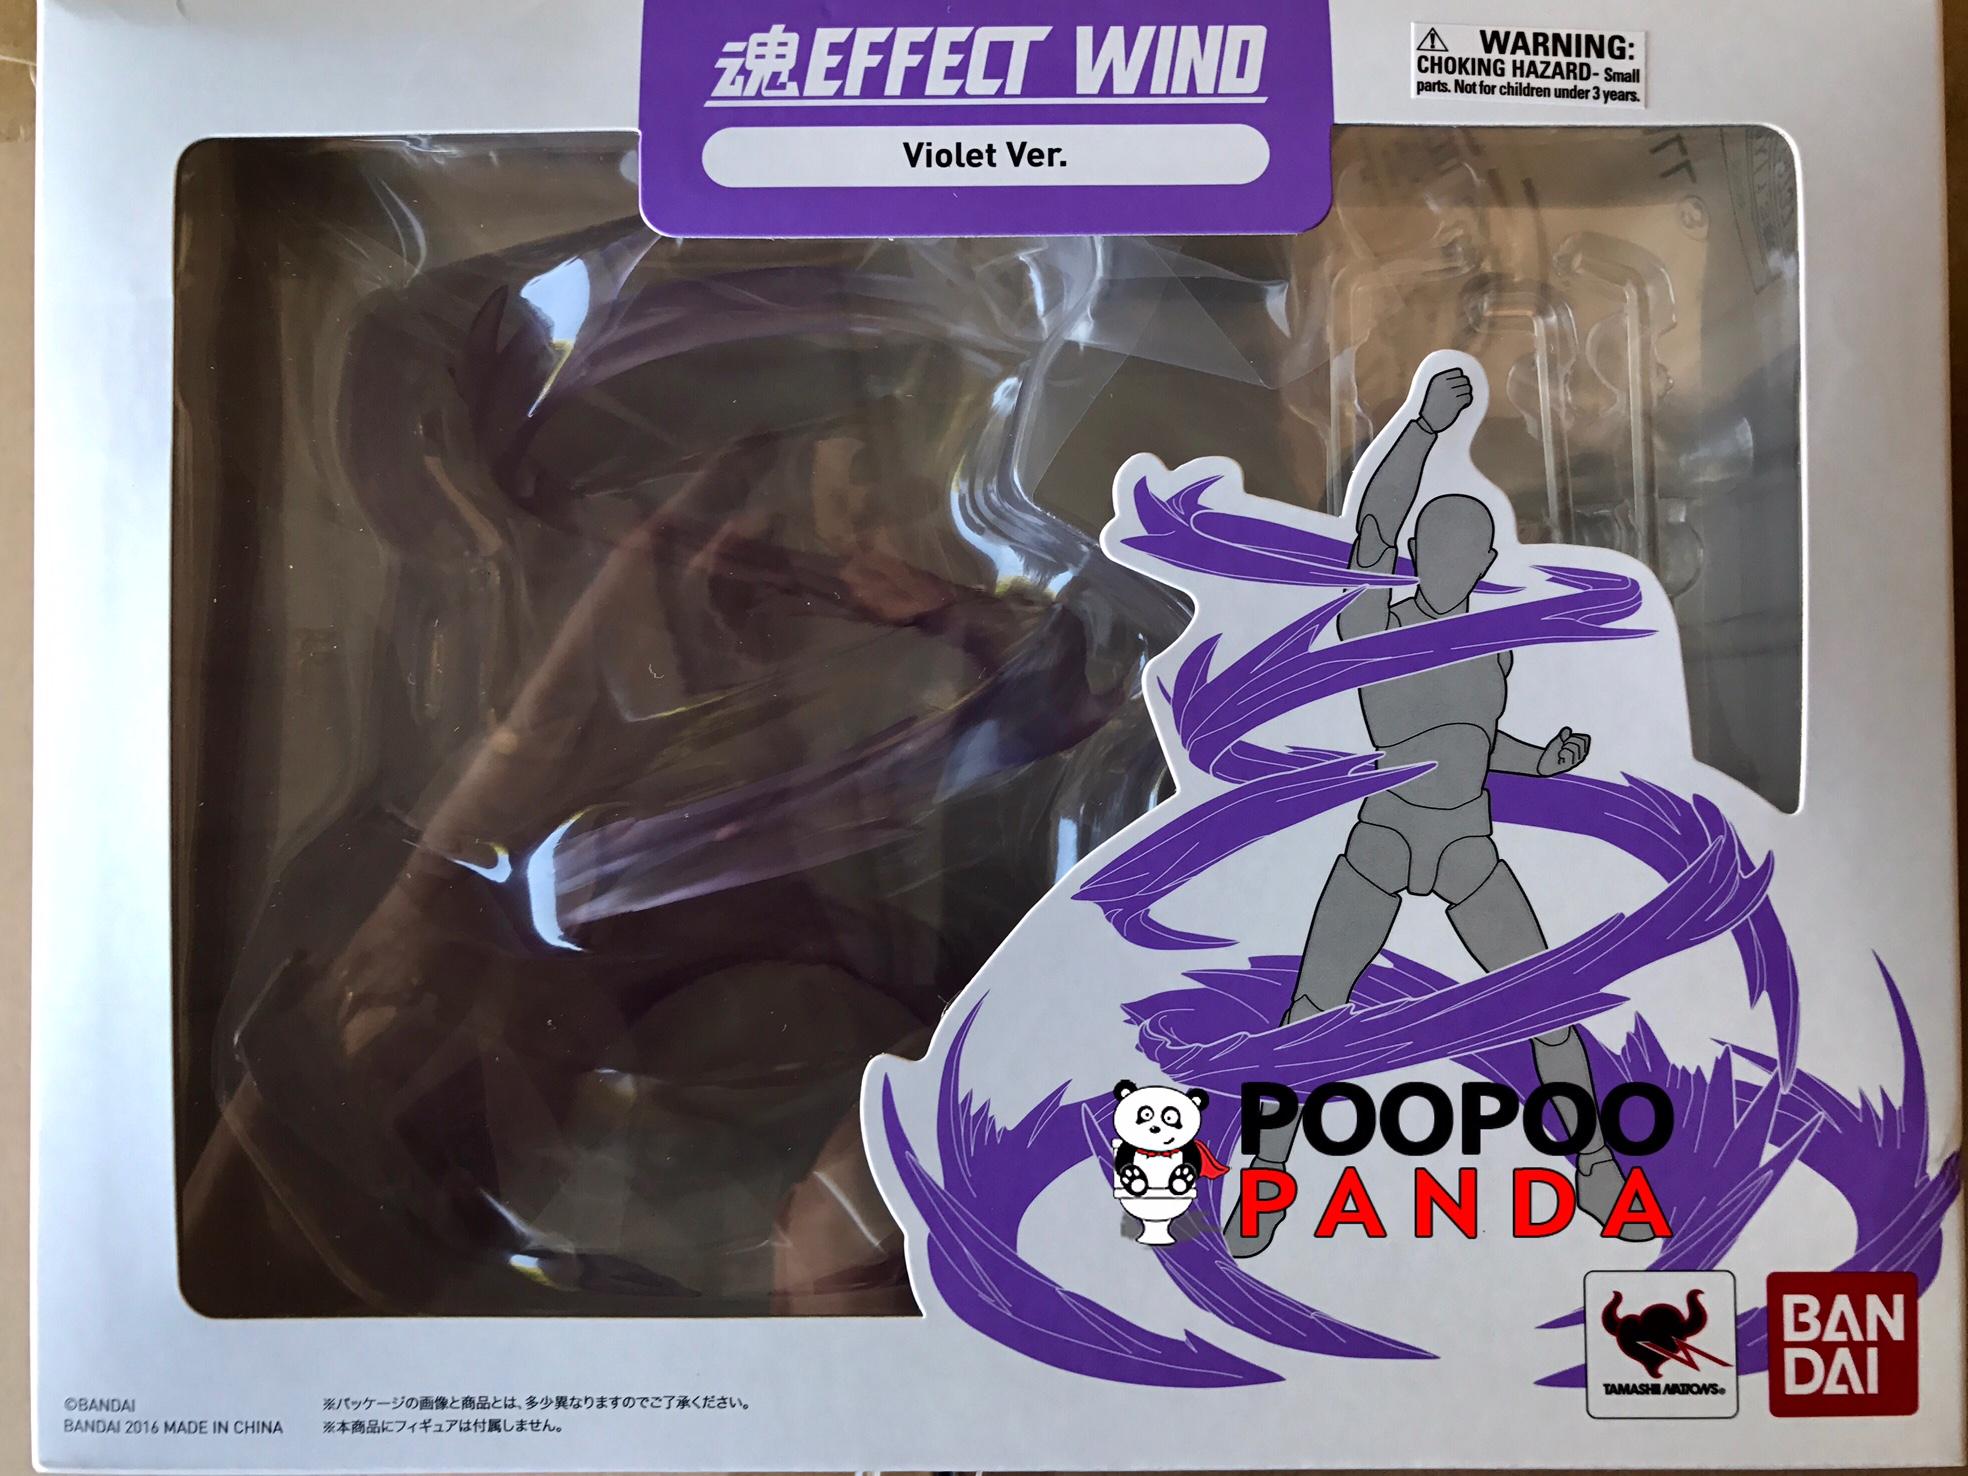 bandai tamashii effect wind (violet ver.)